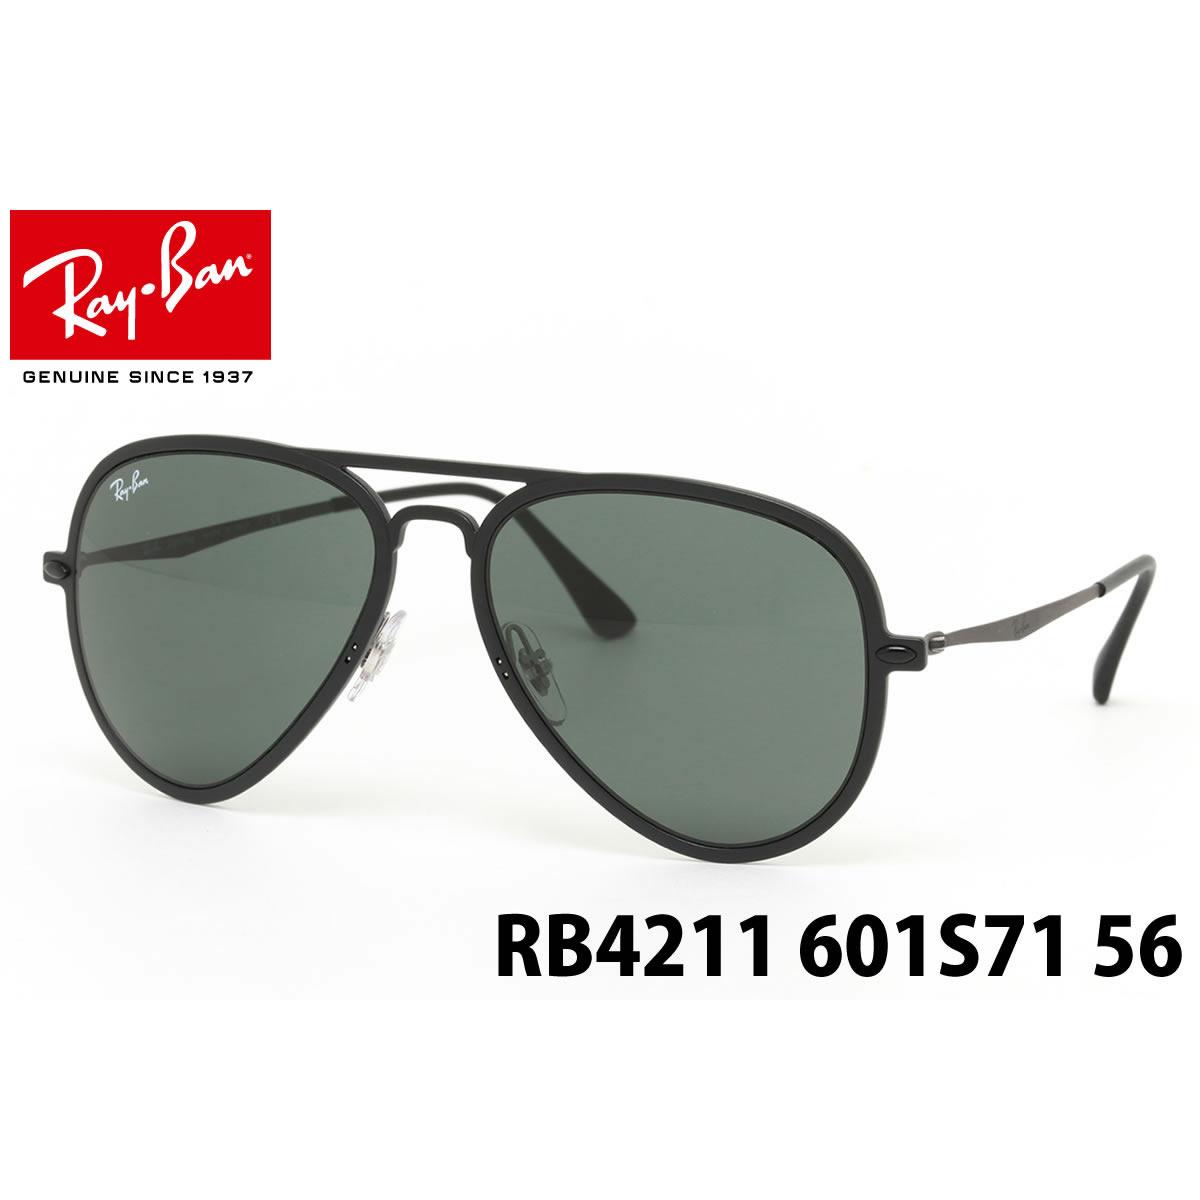 5f0eeff95c Ray-Ban Sunglasses RB4211 601S71 56size TECH AVIATOR LIGHT RAY GENUINE NEW rayban  ray ban ...